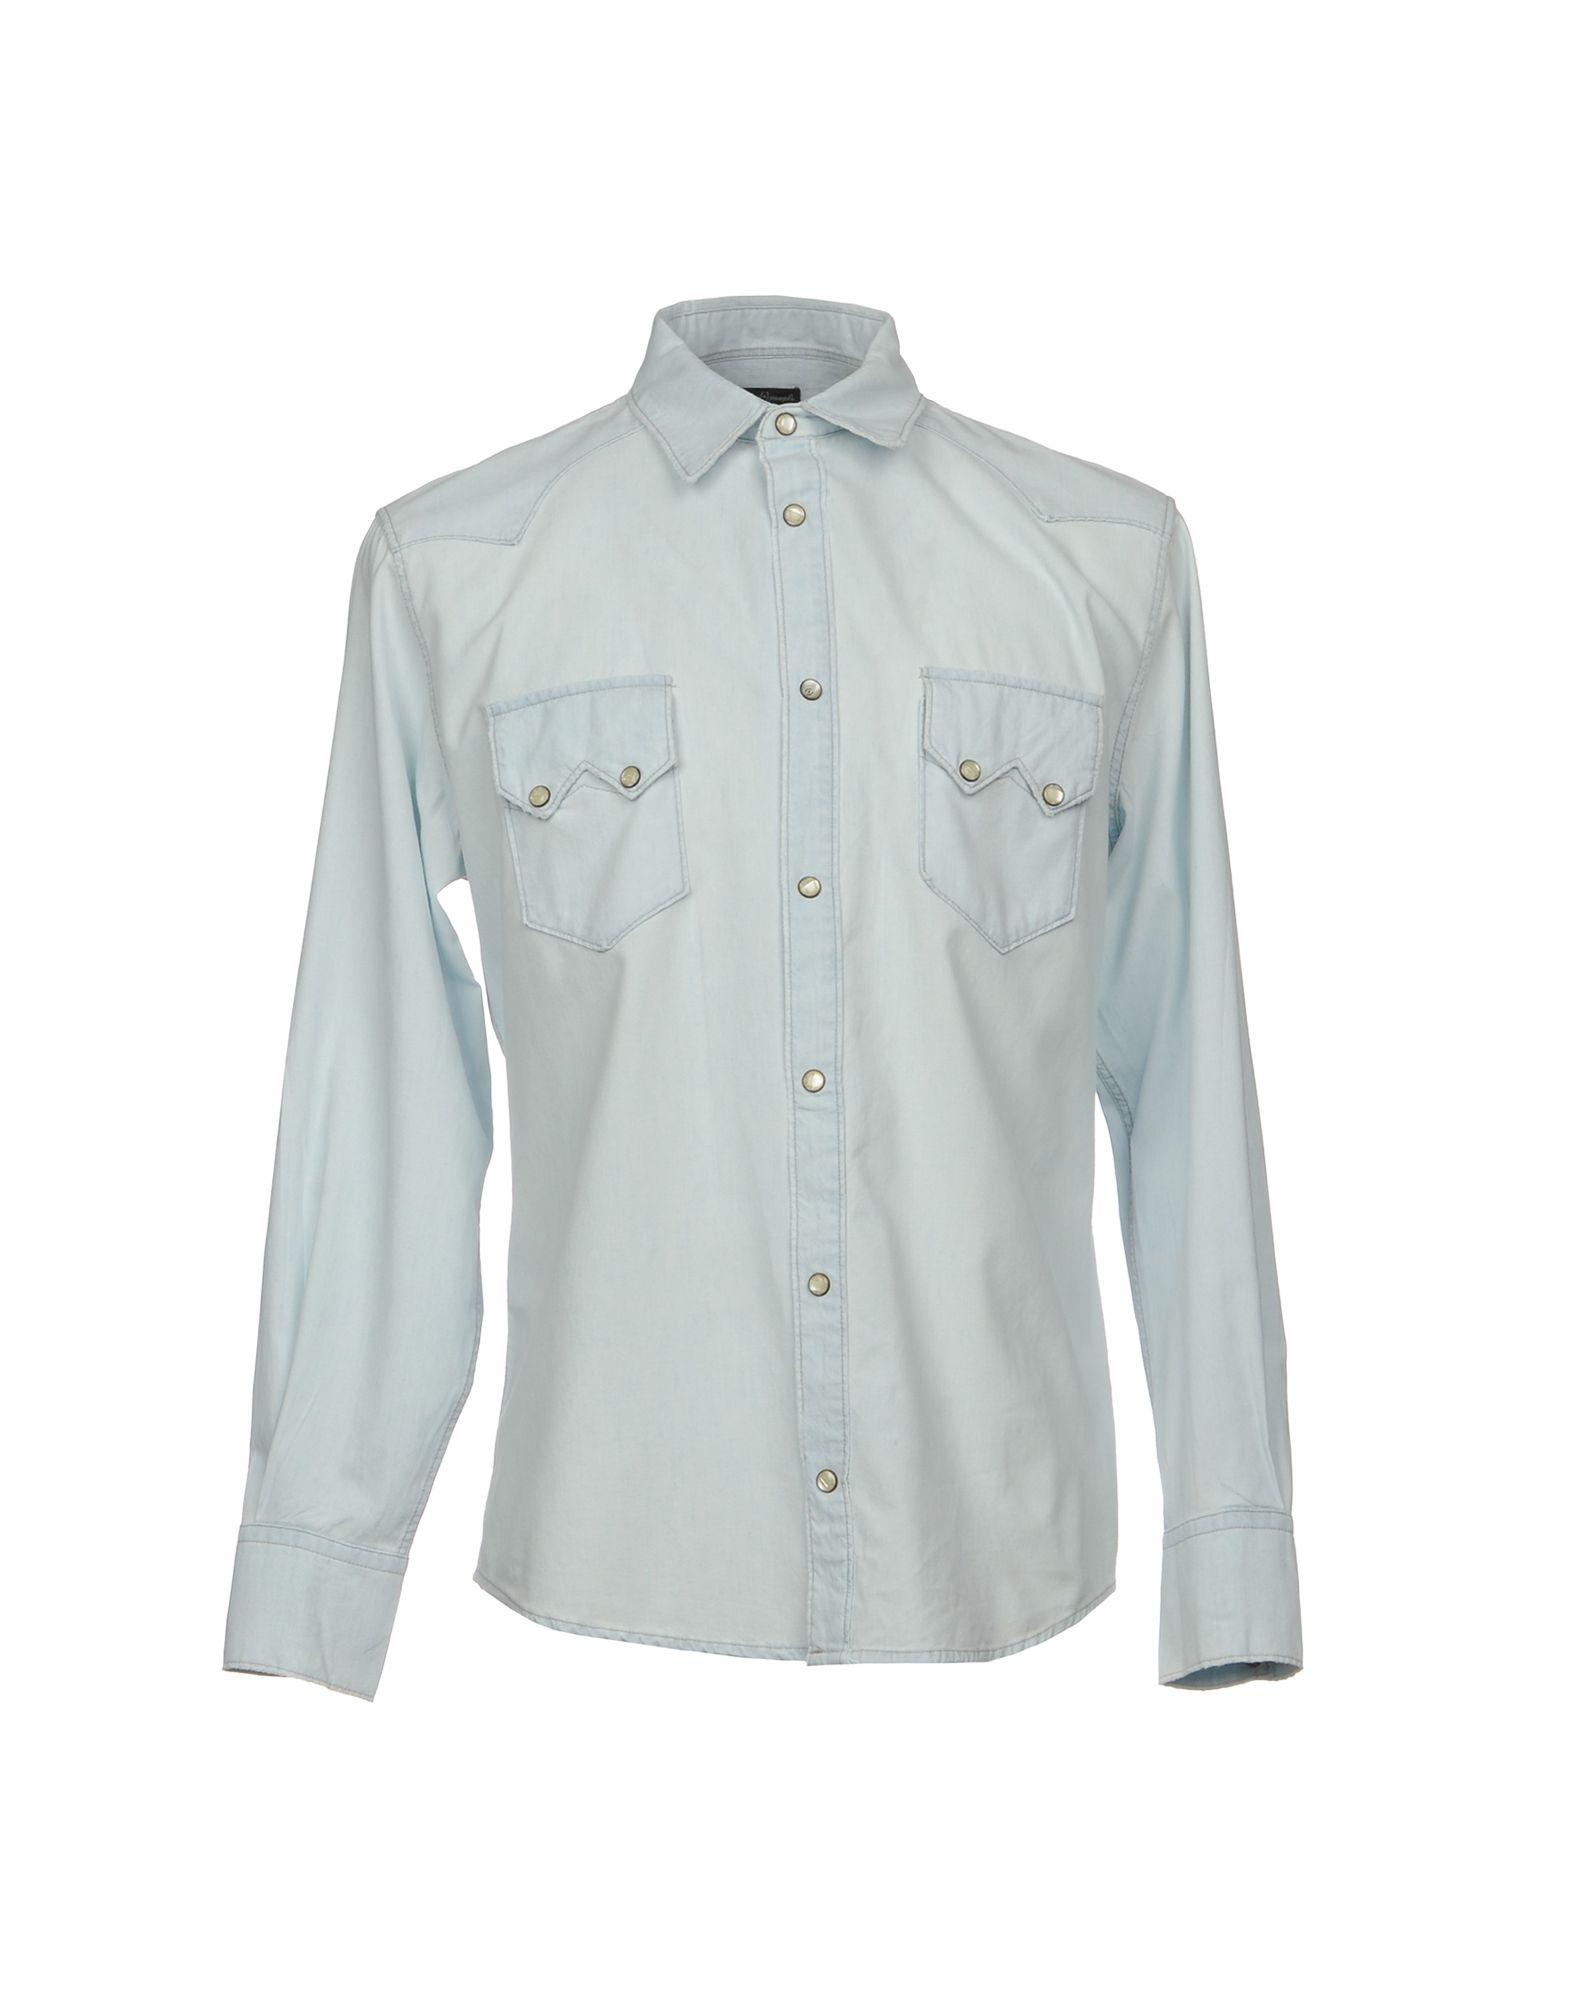 ФОТО (+) people Джинсовая рубашка